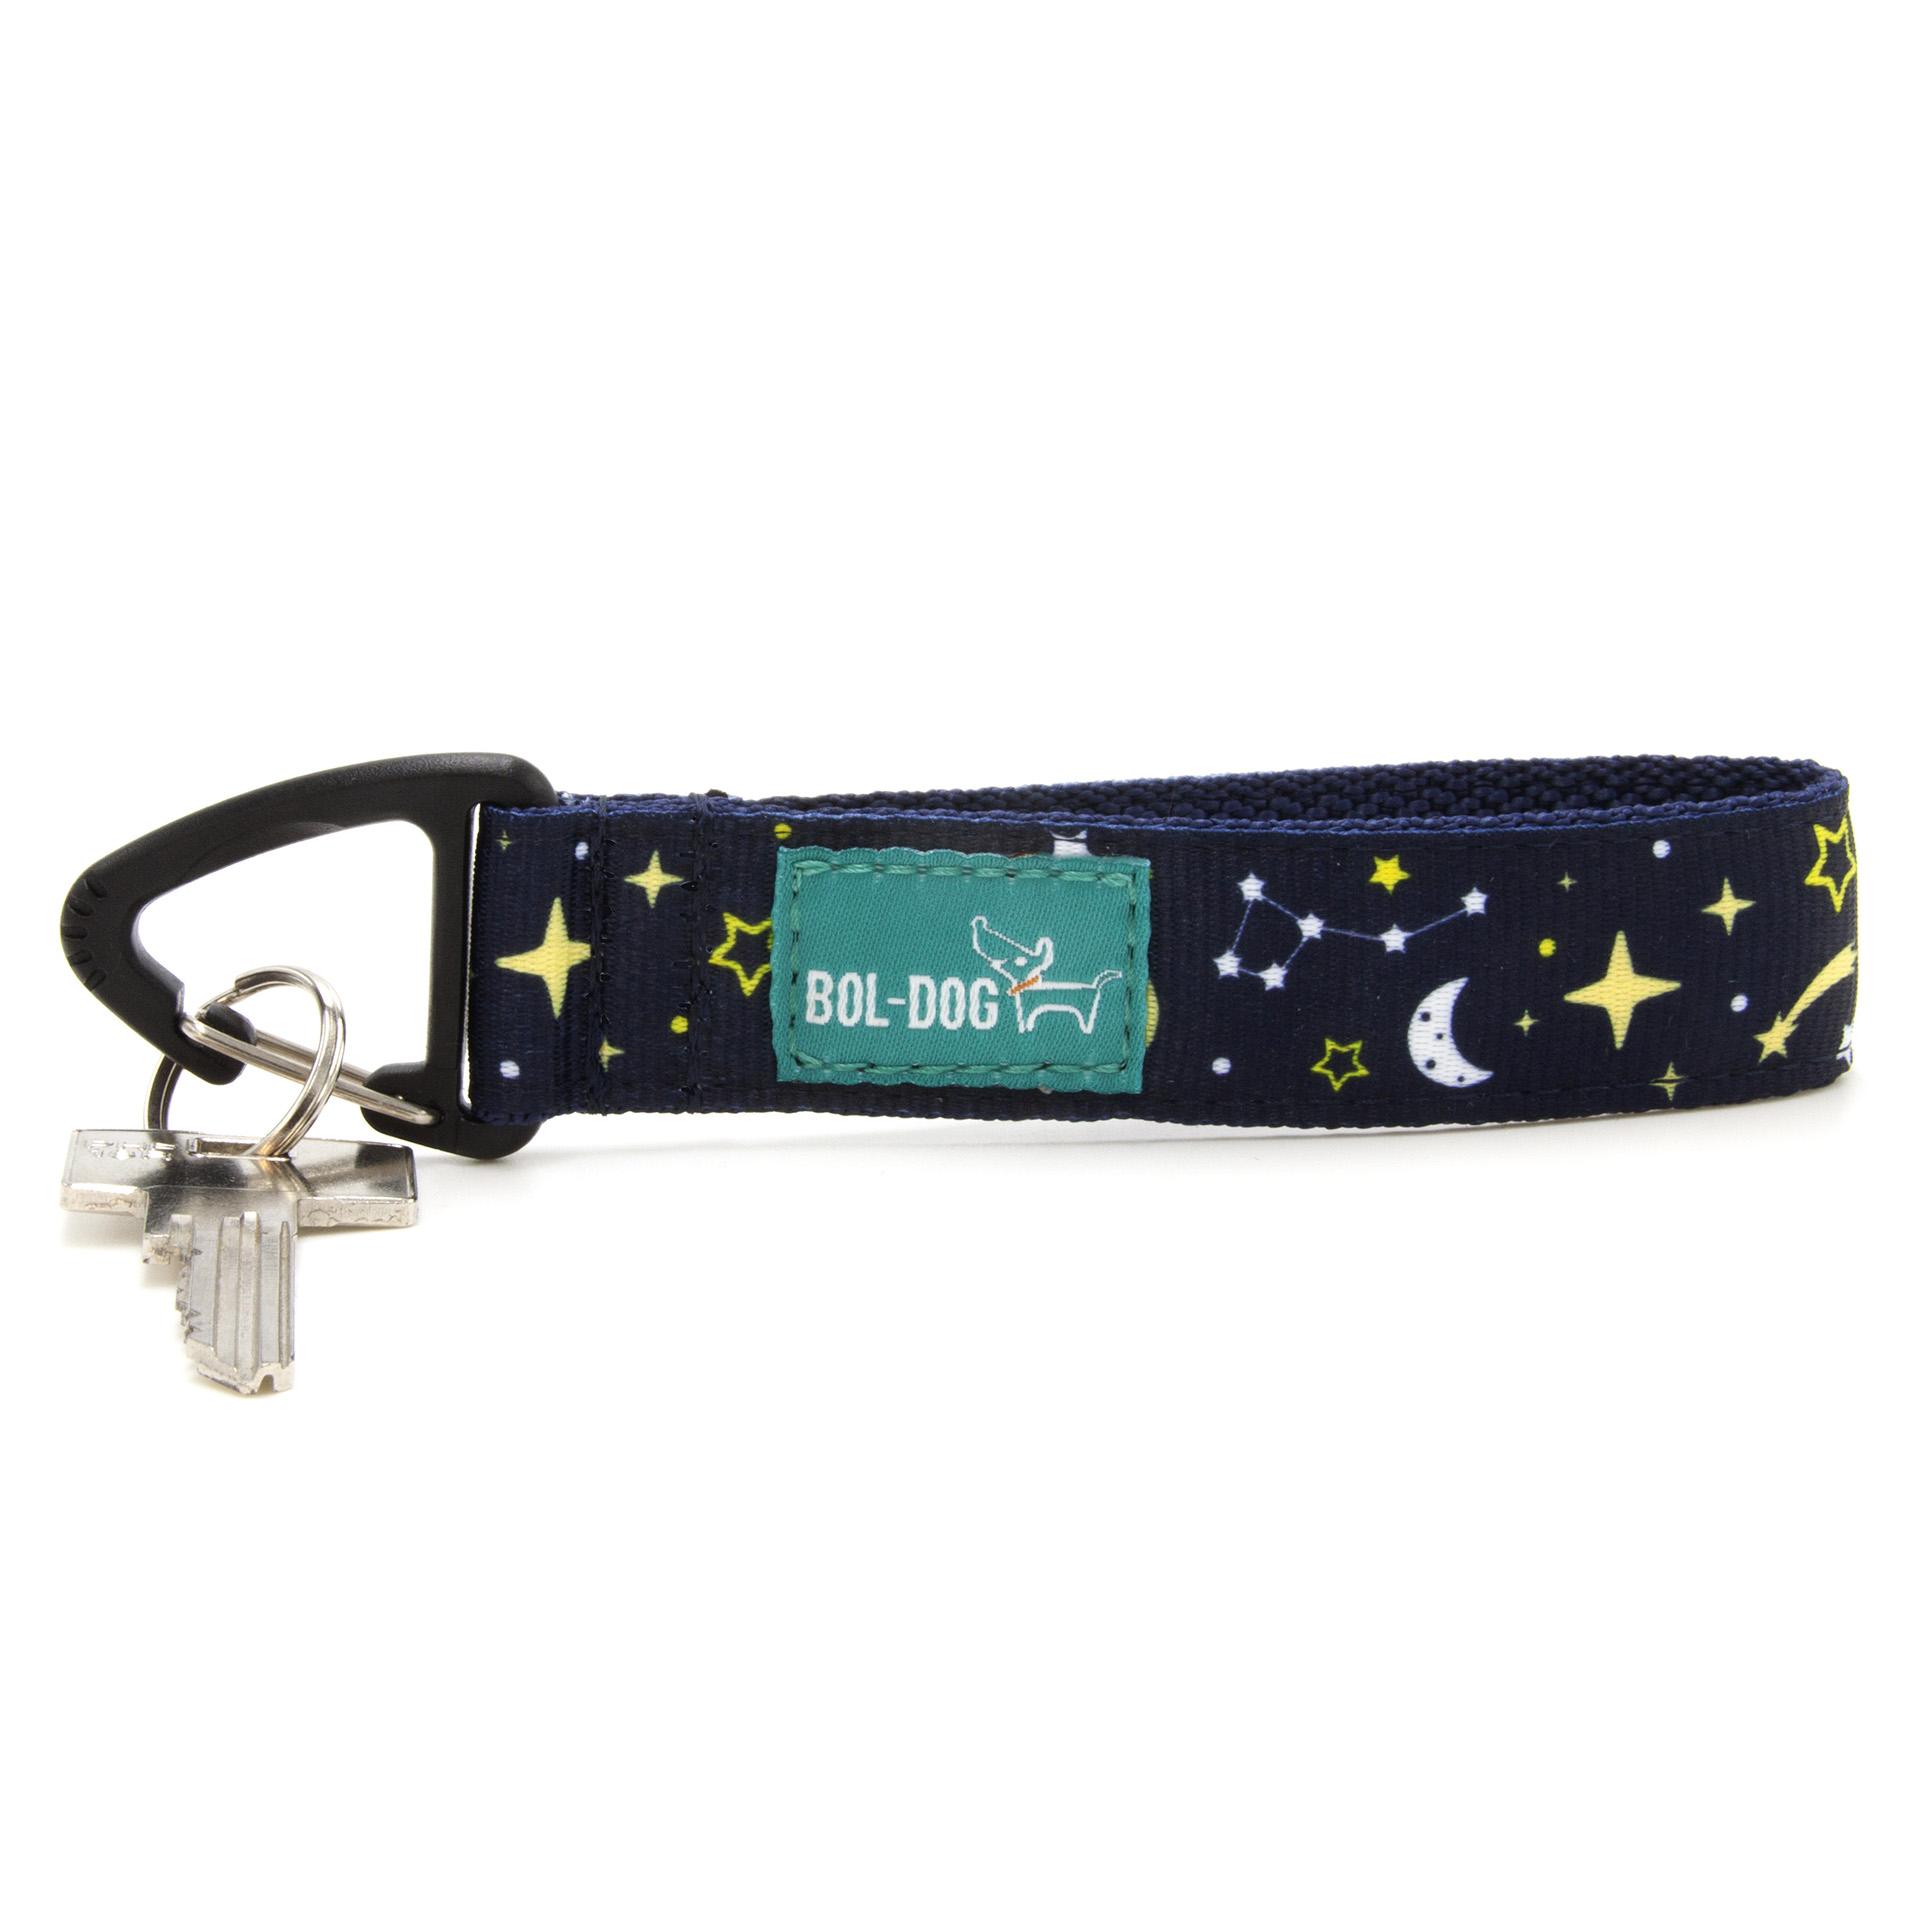 Heaven key holder